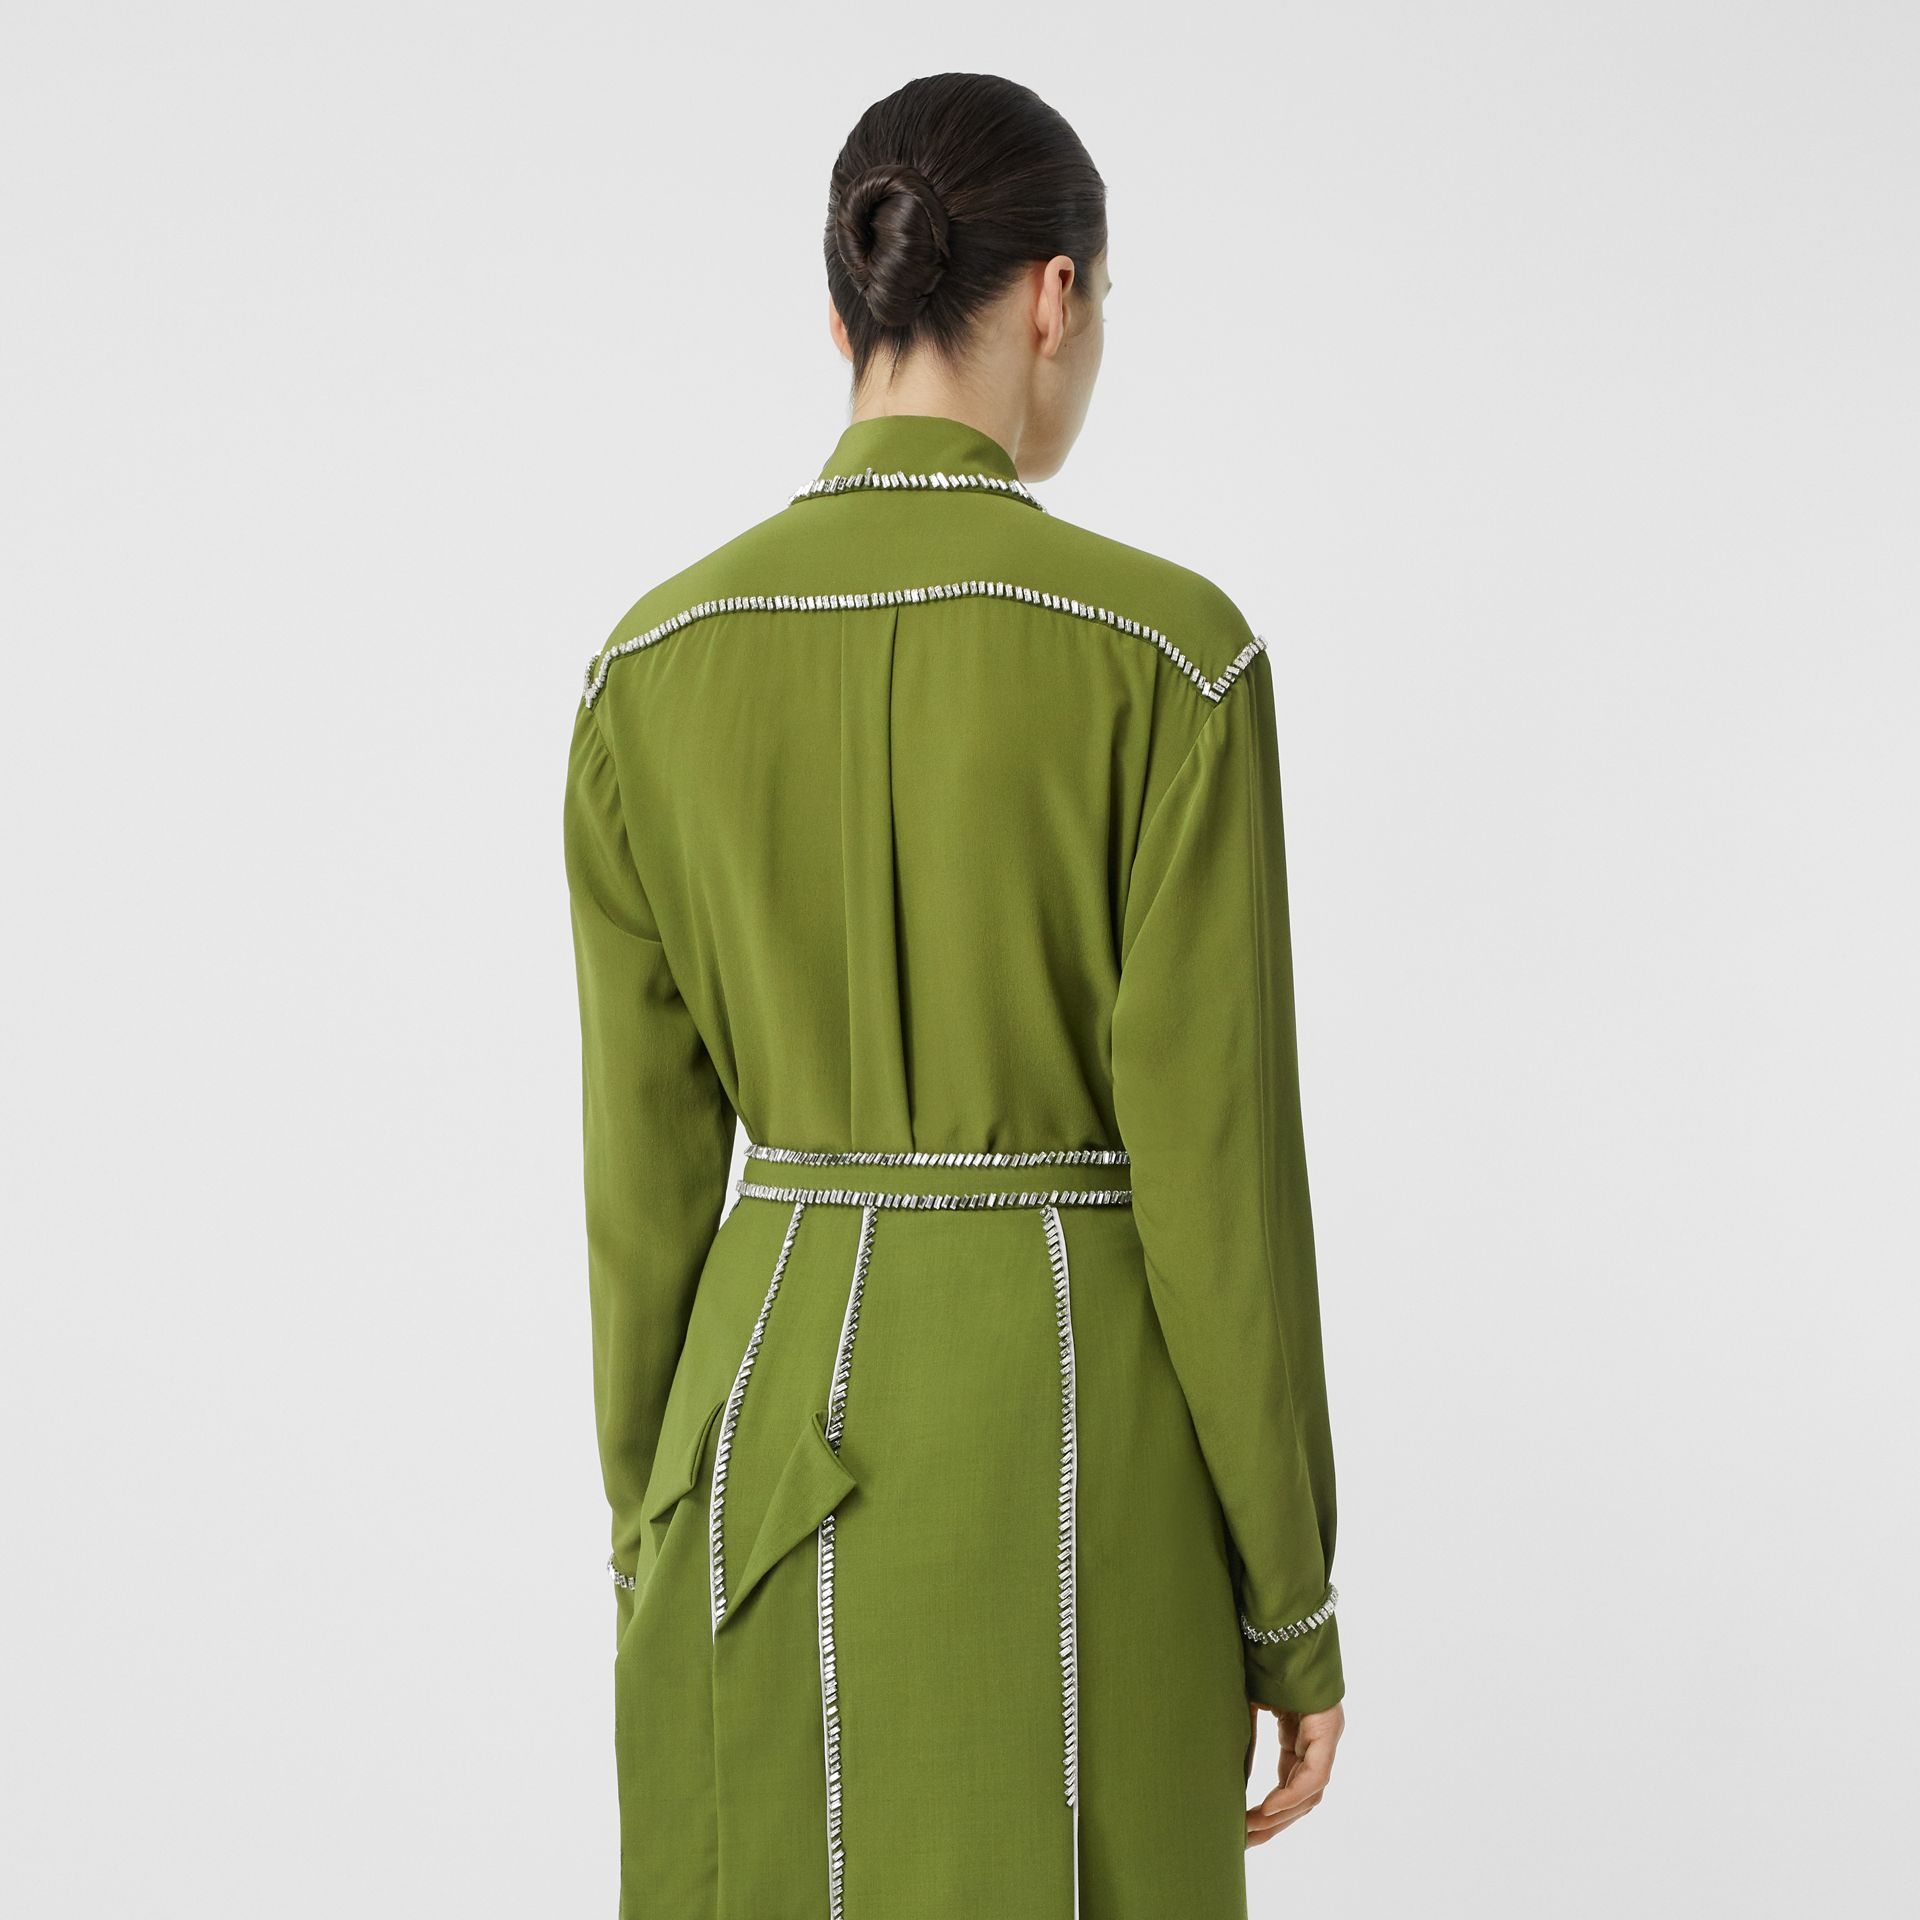 Embellished Silk Oversized Shirt in Cedar Green - Women | Burberry - gallery image 2